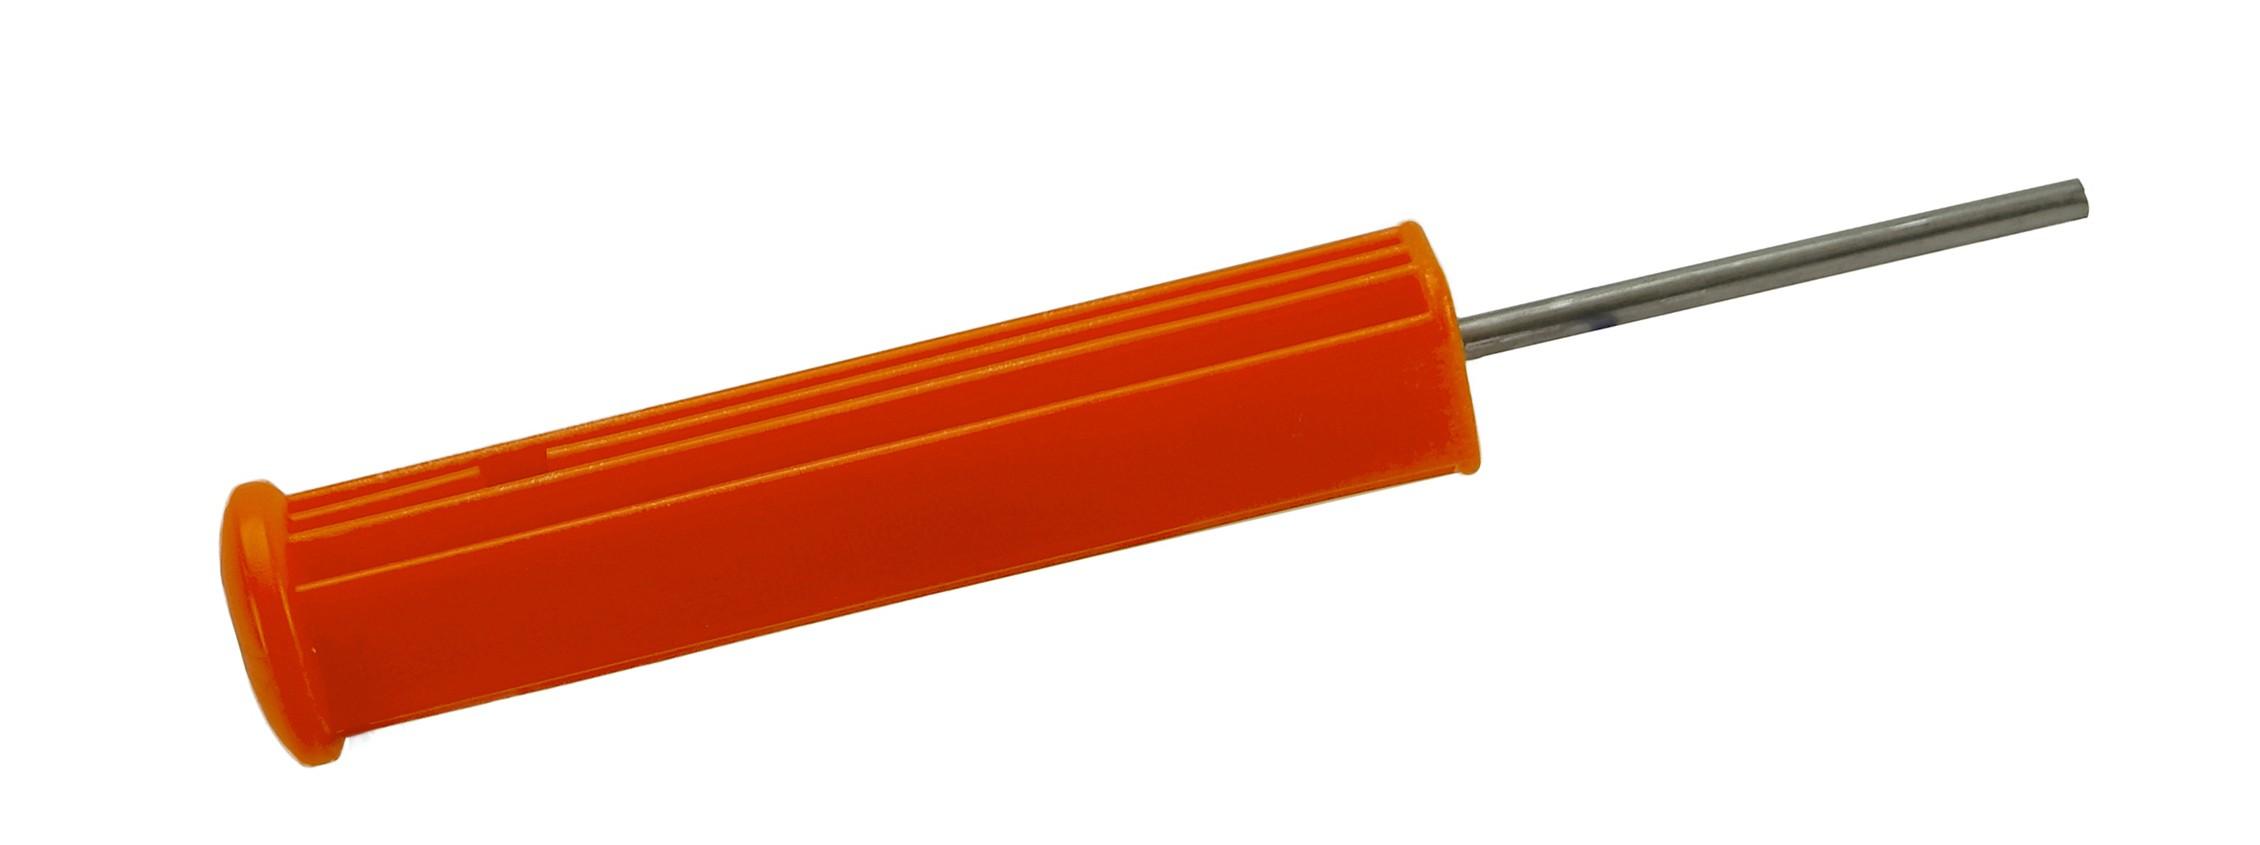 Inslaghulpstuk oranje 155 VD